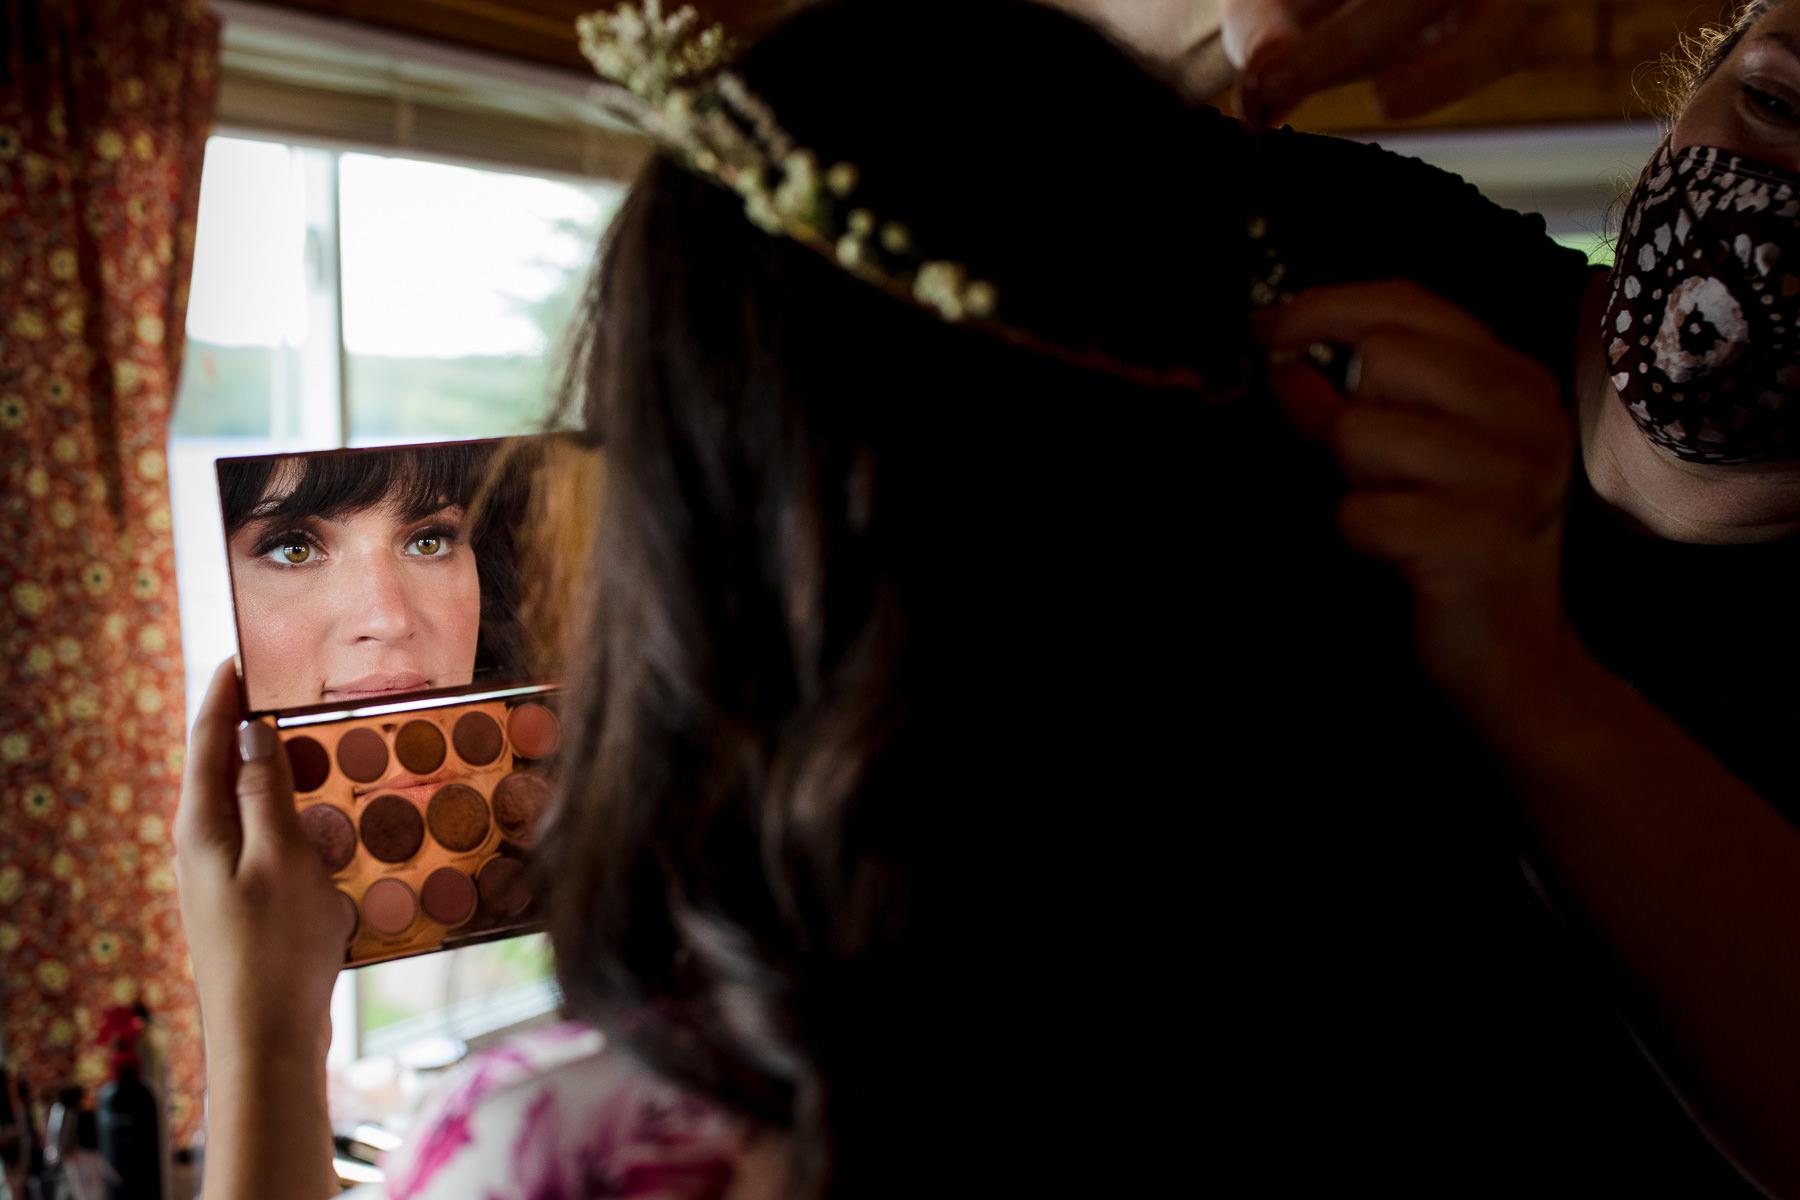 Private Adirondacks Upstate New York Wedding Venue | De bruid die een kijkje neemt in haar pas opgemaakte make-up